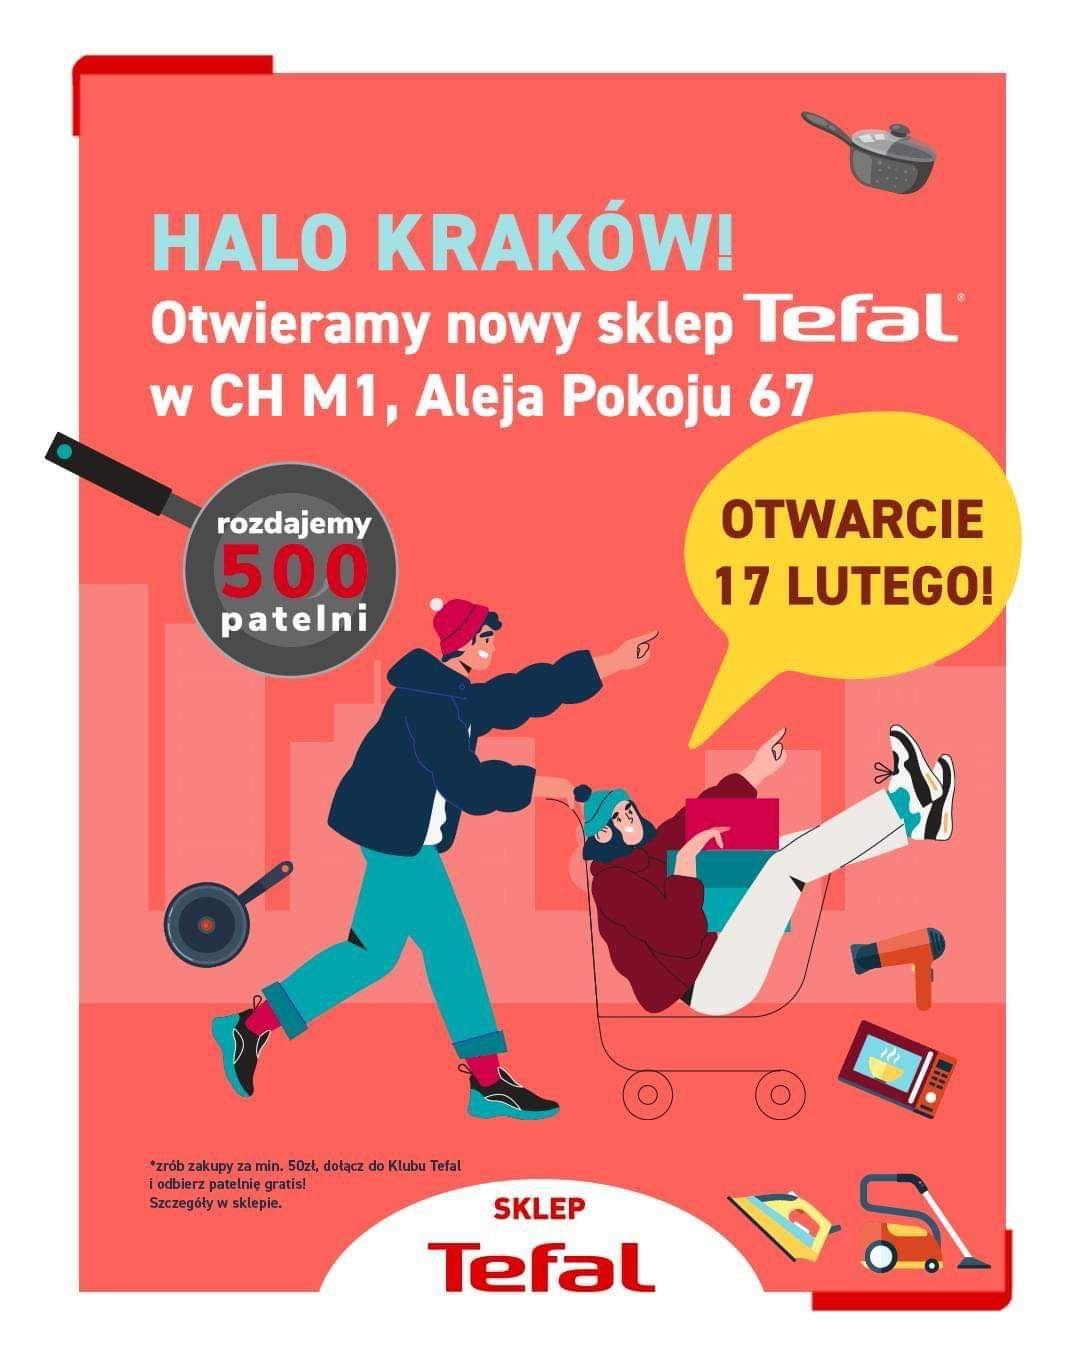 Patelnia gratis za zakupy za 50 zł w Tefal